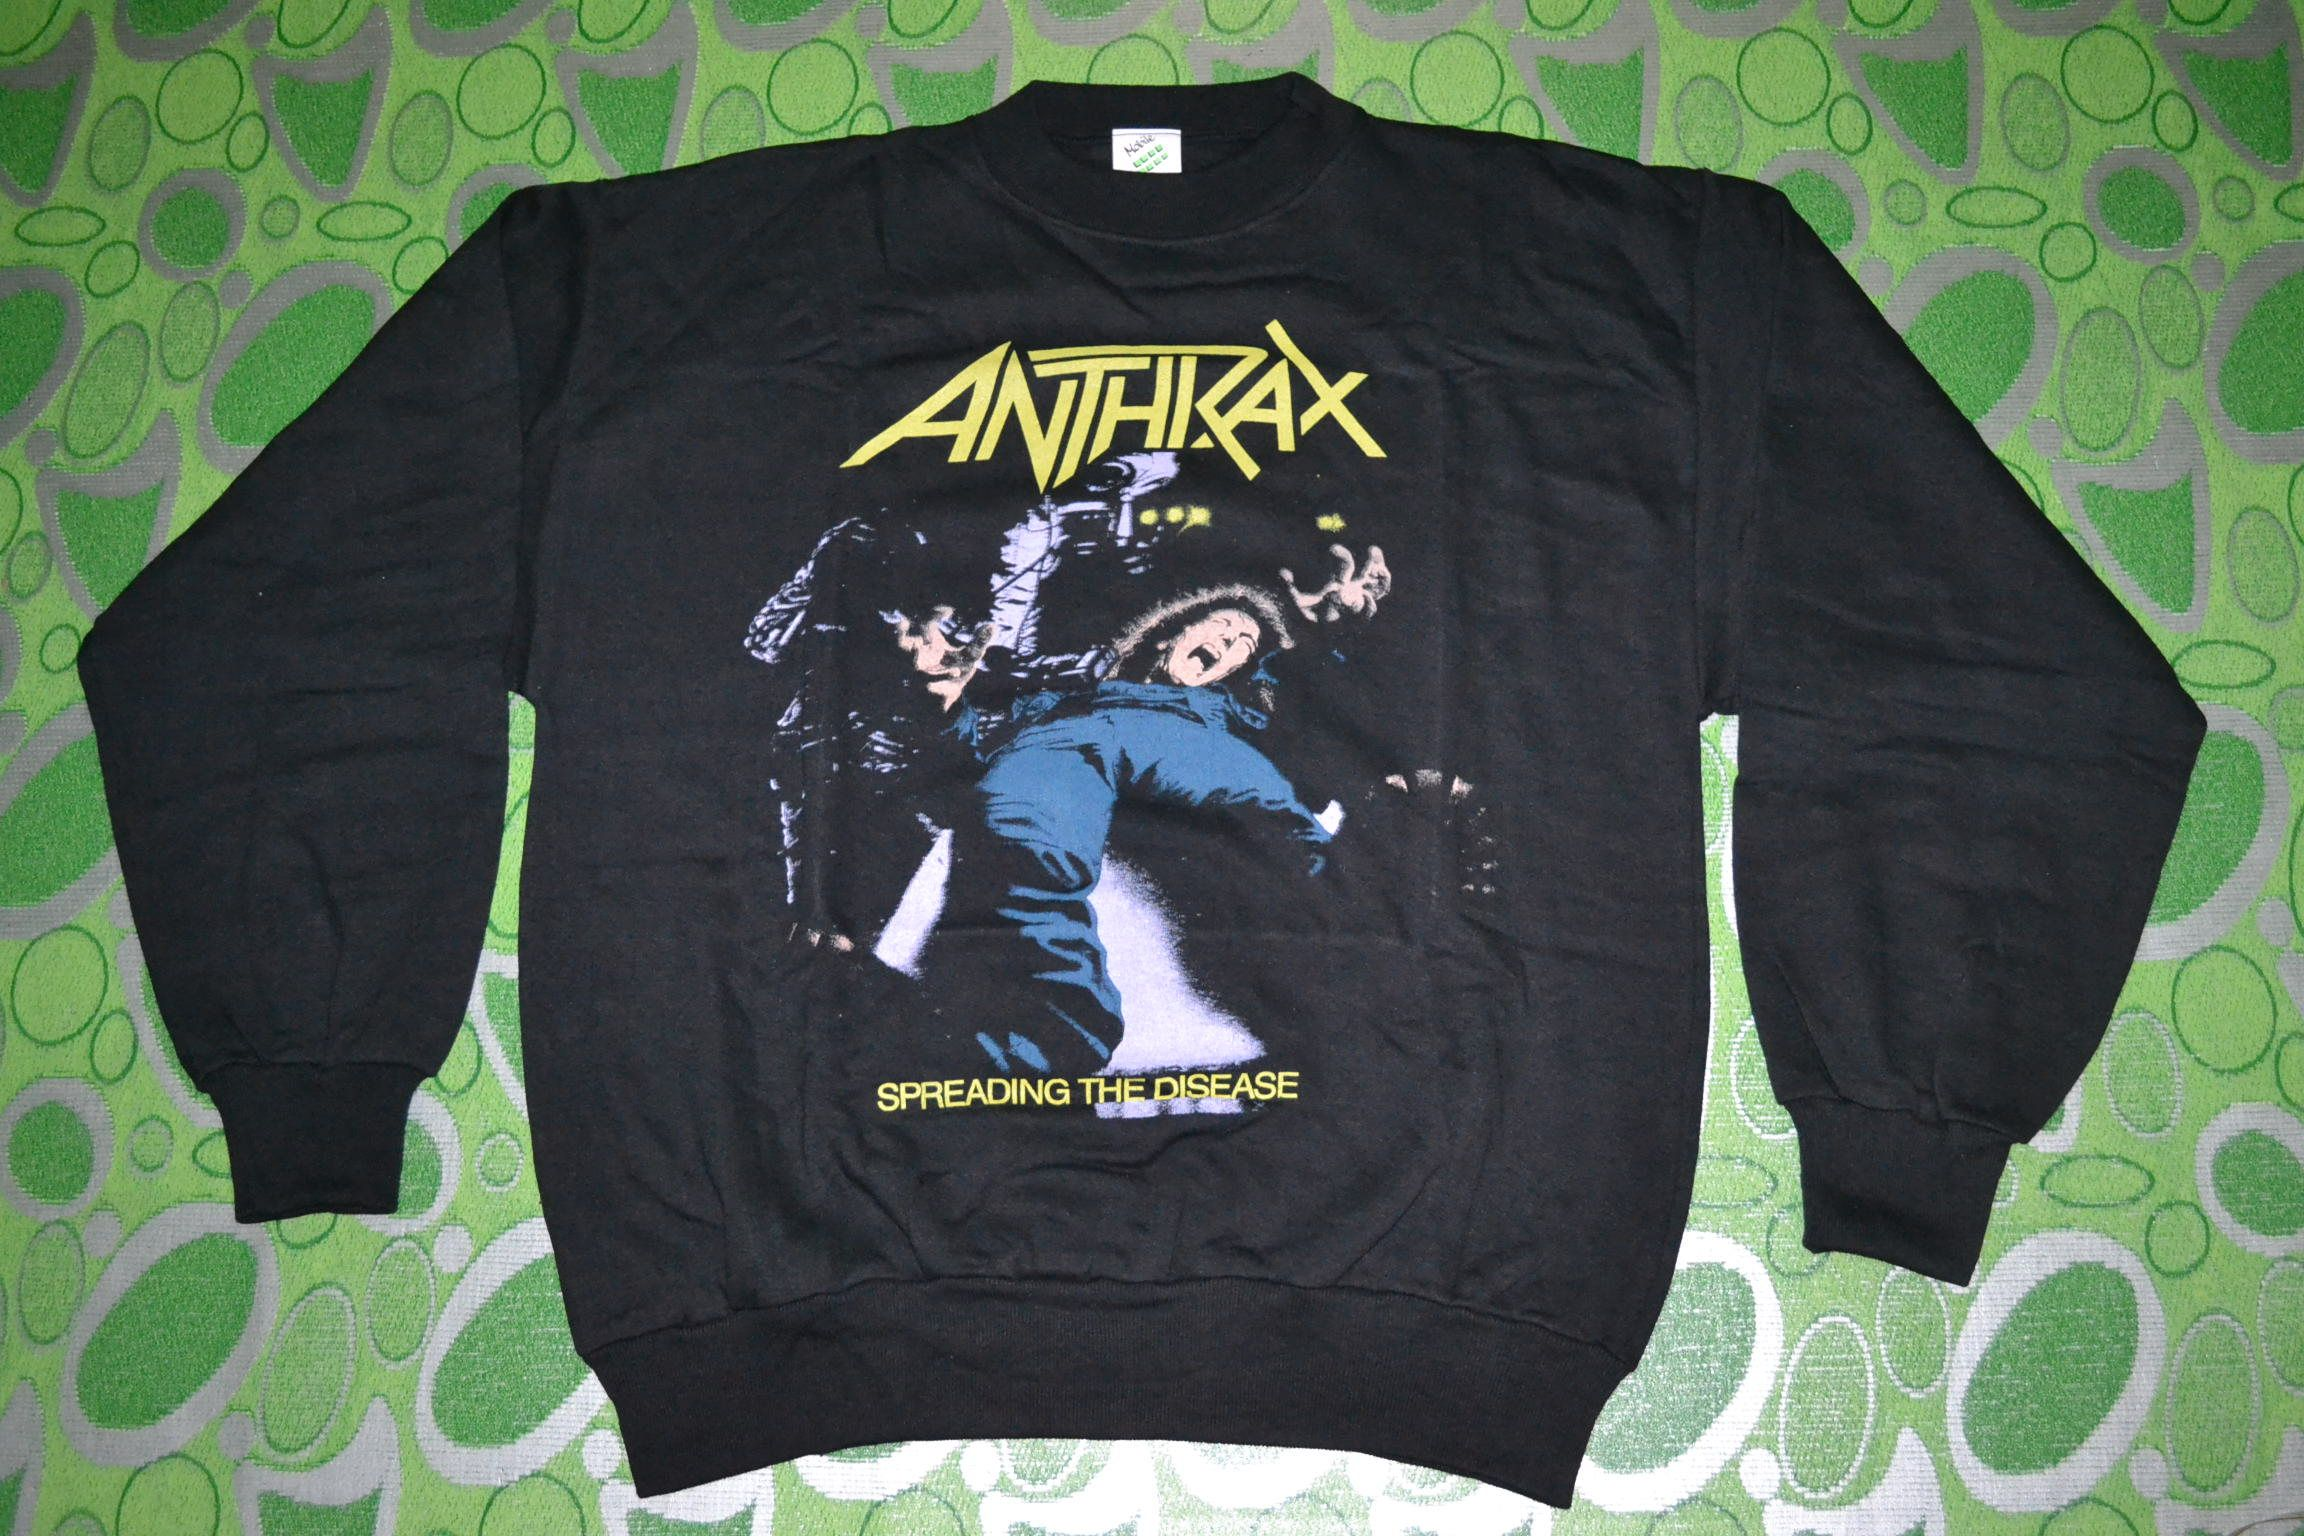 Black sabbath t shirt etsy - 20 Vintage 80s Anthrax Spreading The Disease Tour Concert Promo Xl Size Rare Sweatshirt T Shirt